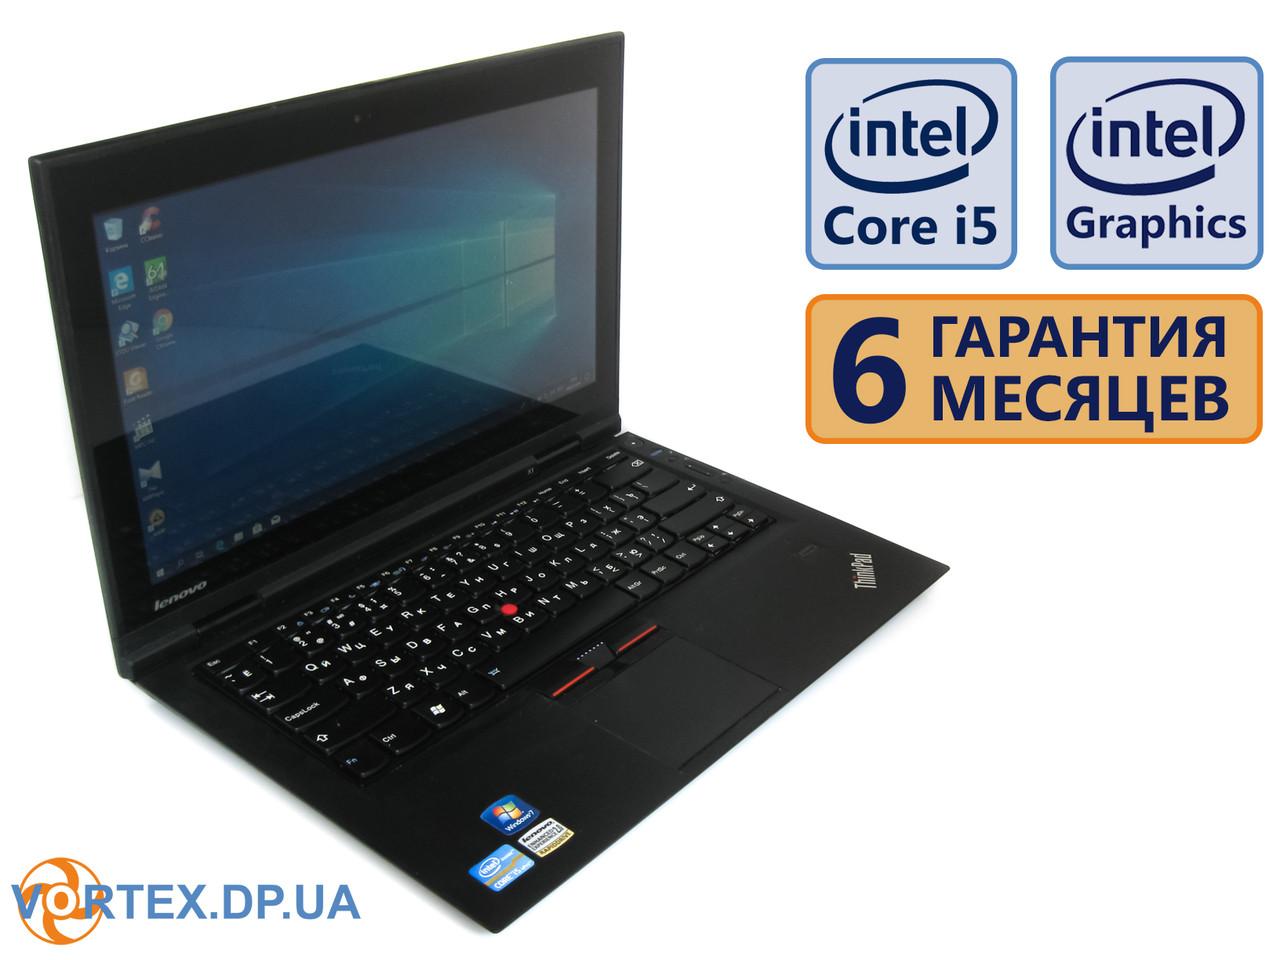 Ультрабук Lenovo ThinkPad X1 13.3 (1366x768) / Intel Core i5-2520M (2x